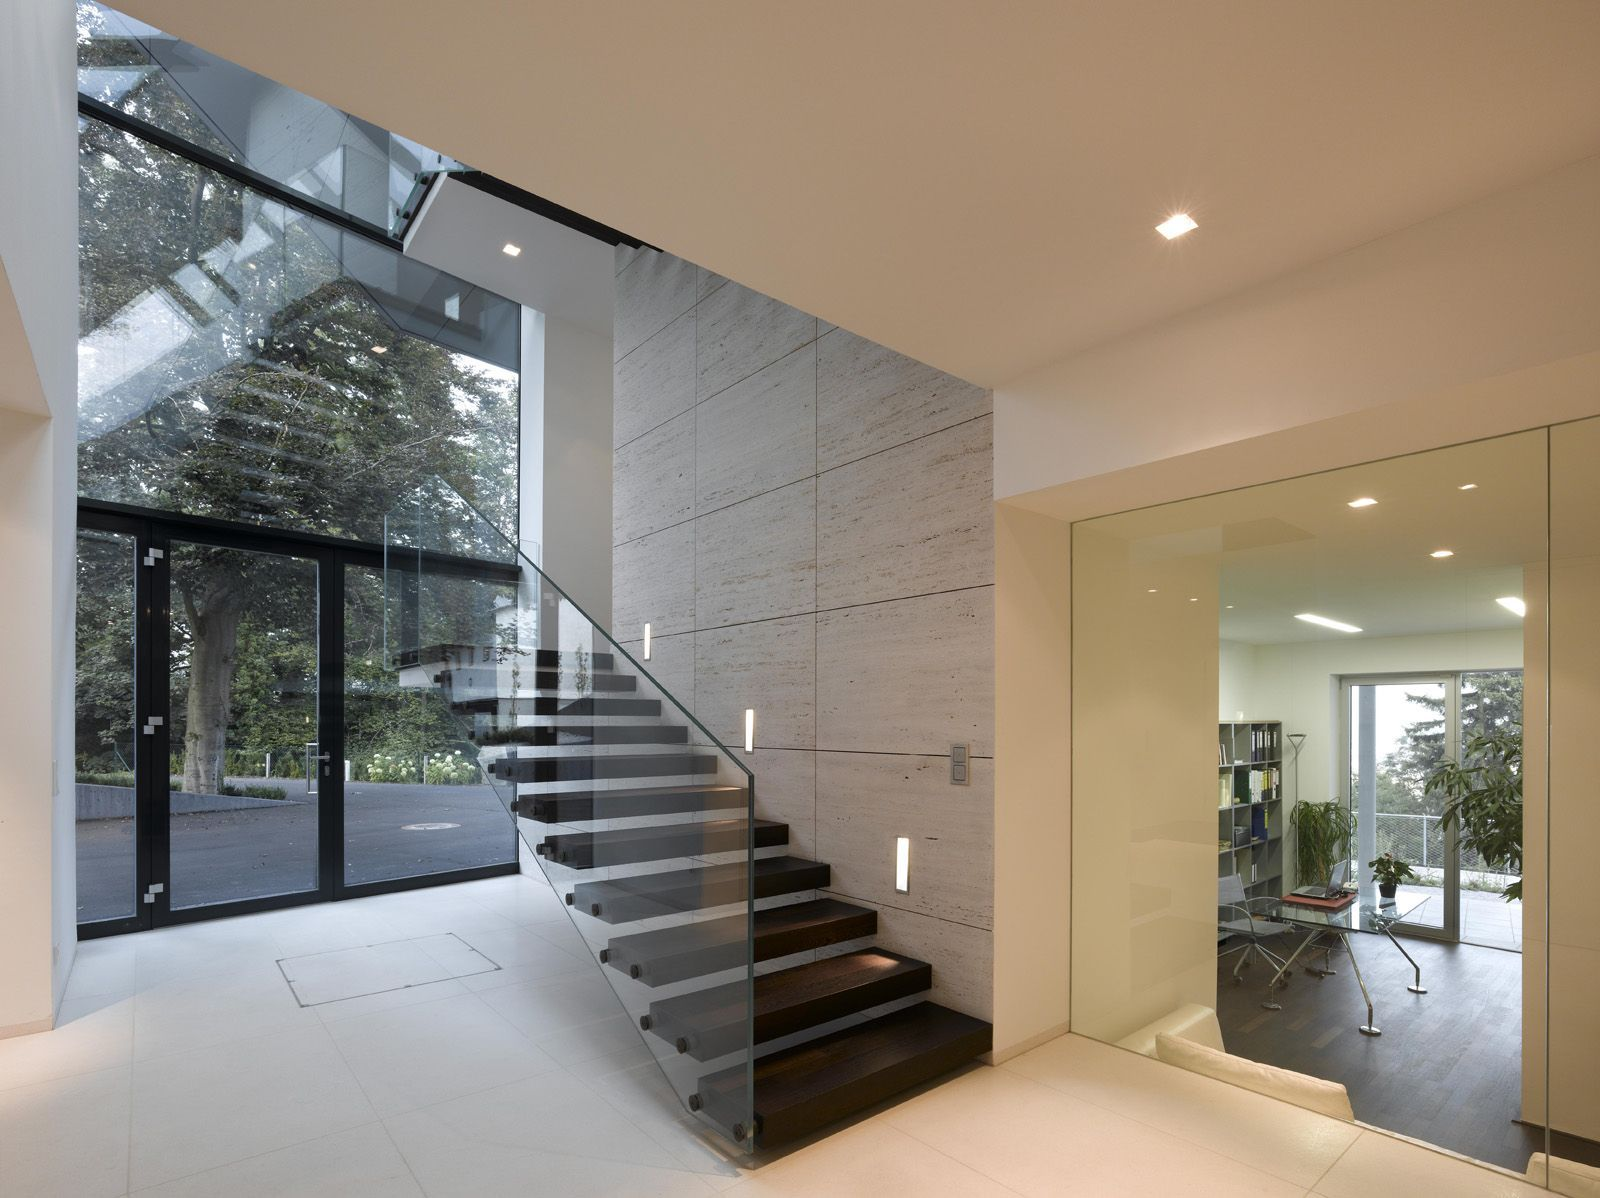 Modern contemporary villa a interior space photo sphera